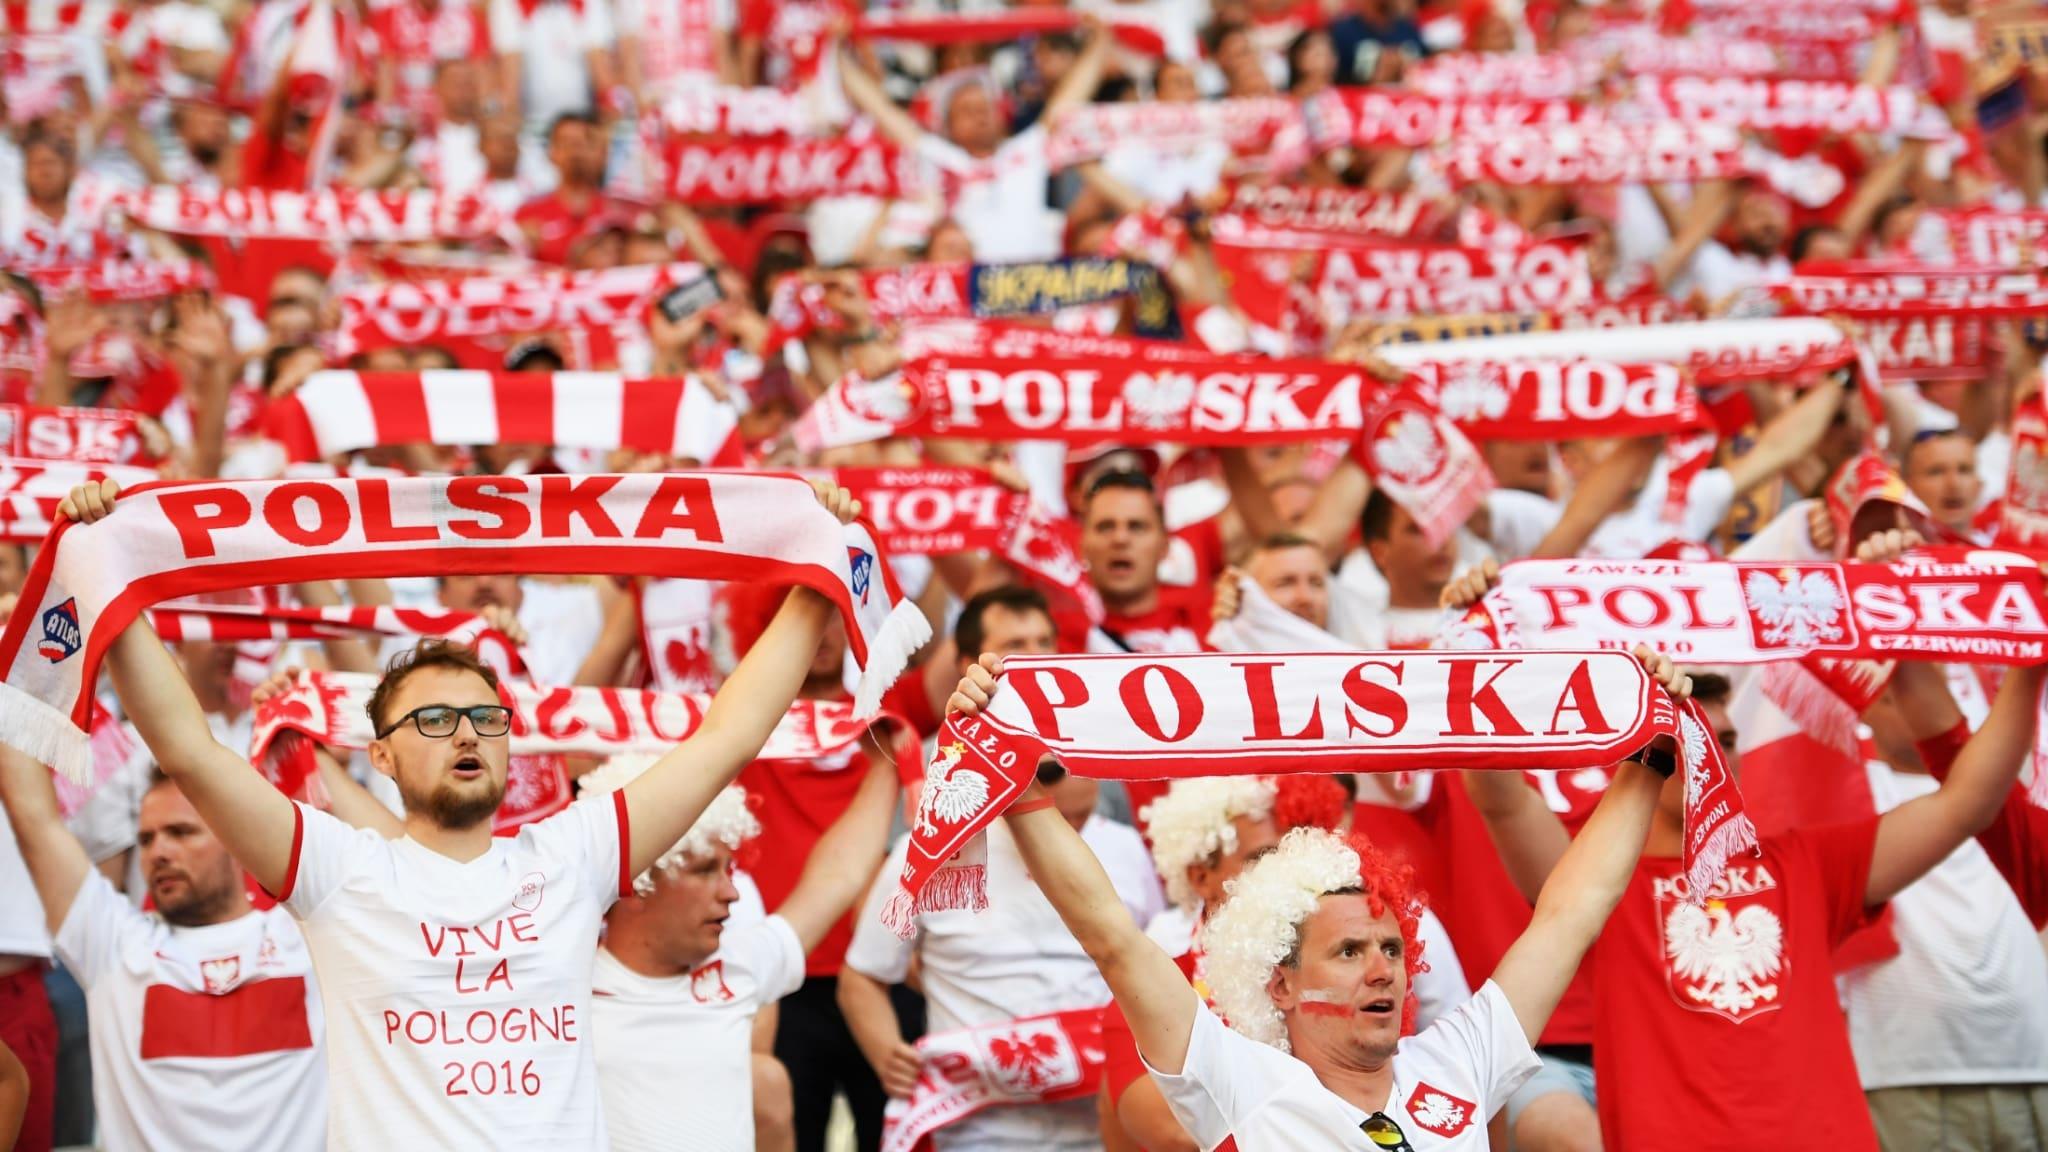 FIFA U 20 World Cup Poland 2019   Organisation   Ticketing   FIFAcom 2048x1152